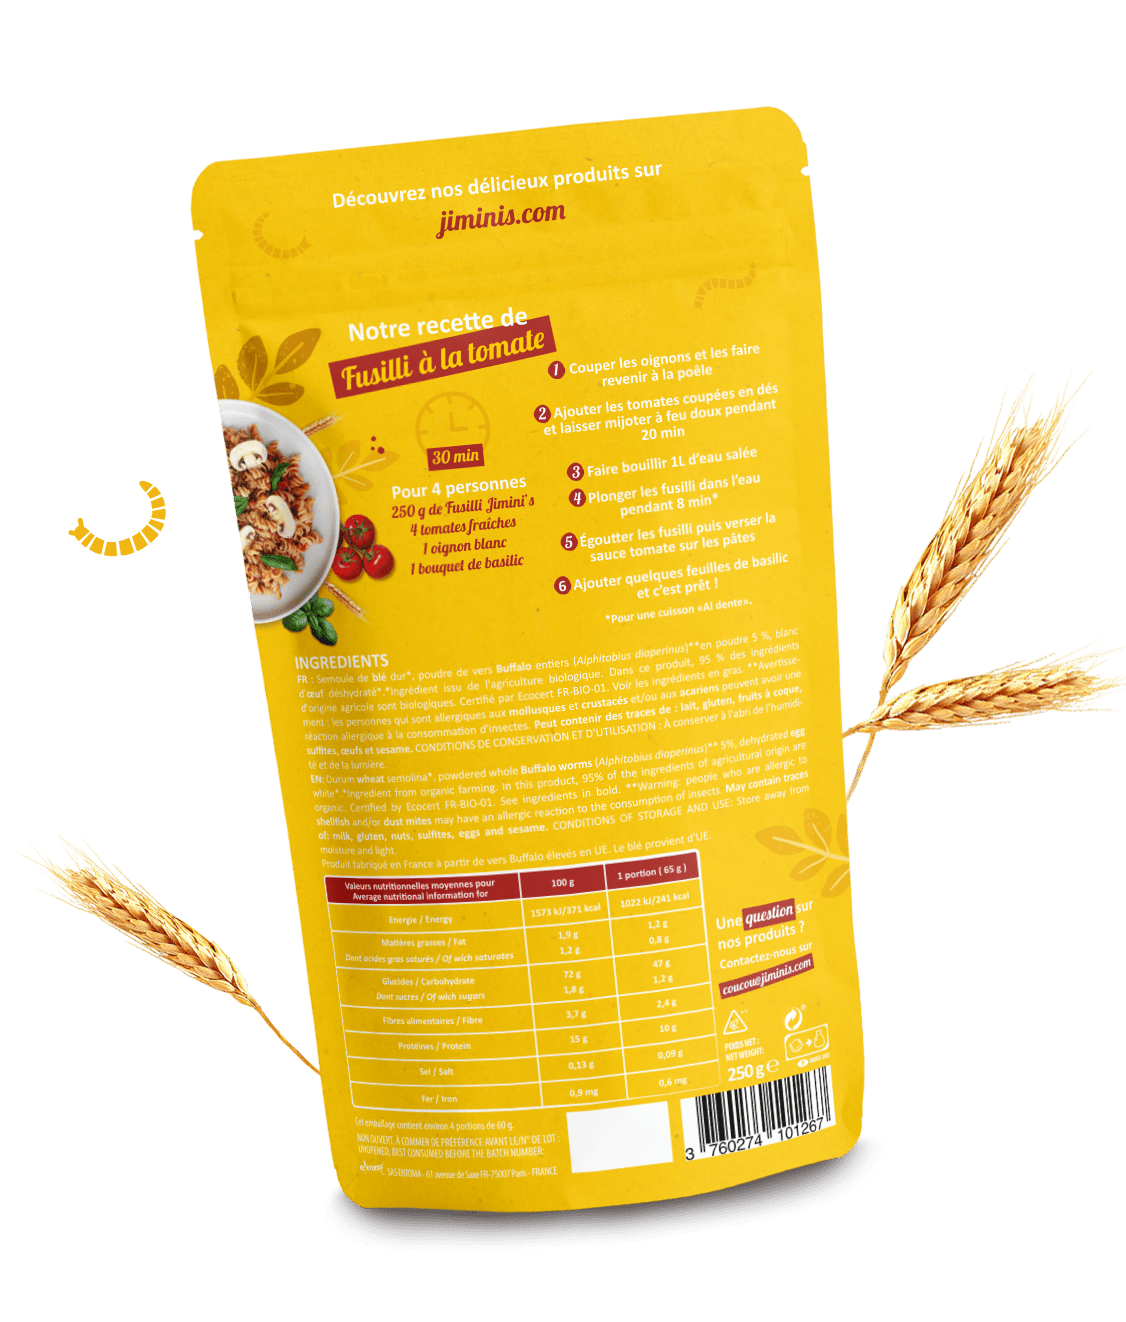 Fusilli protein pasta with Buffalo powder